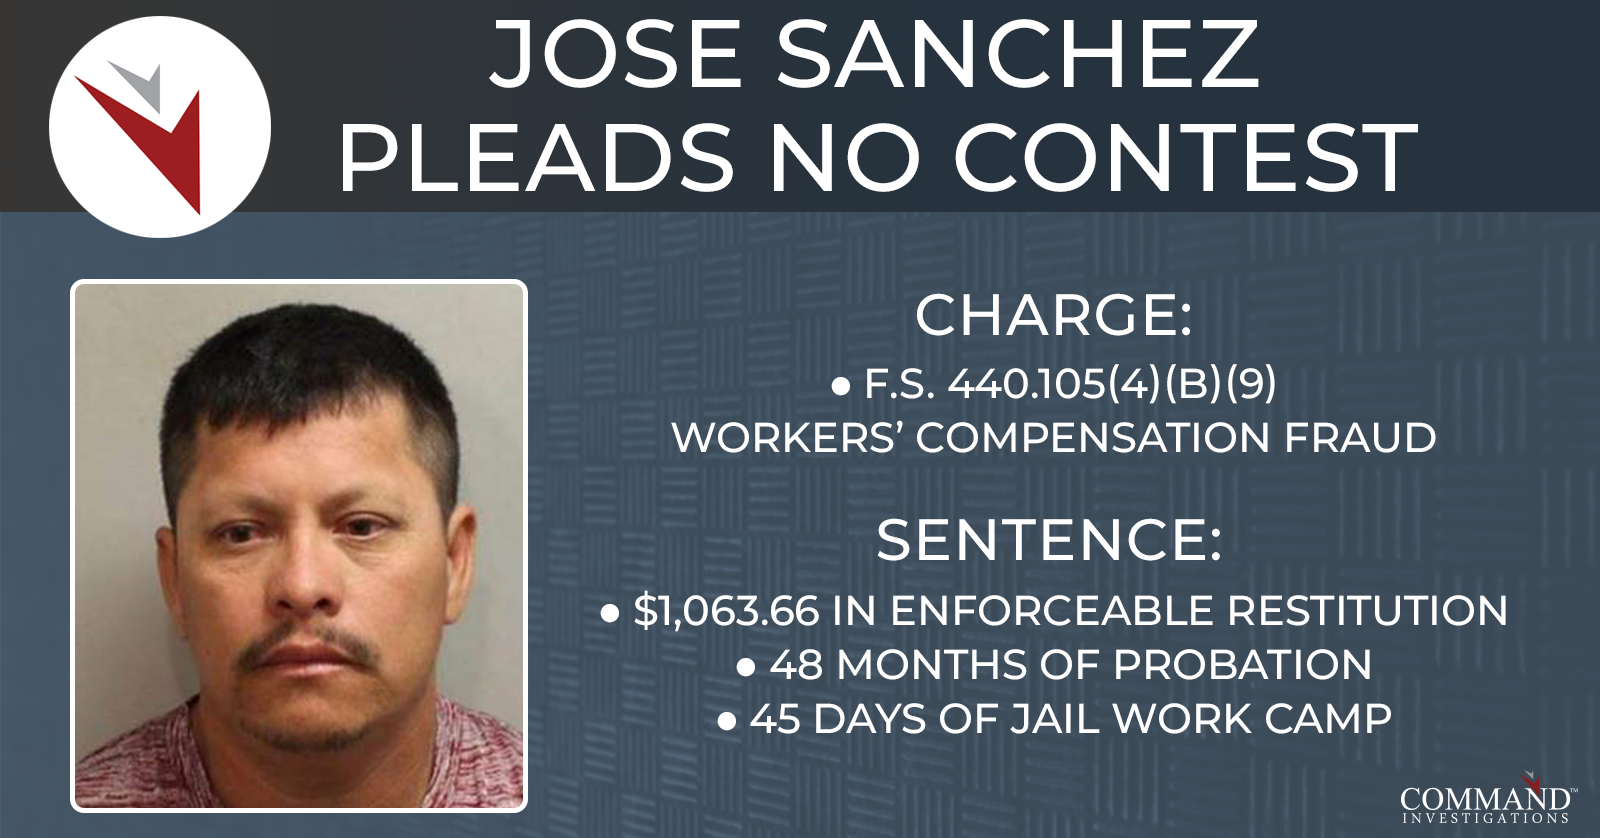 Jose Sanchez pleads no contest to workers' compensation fraud